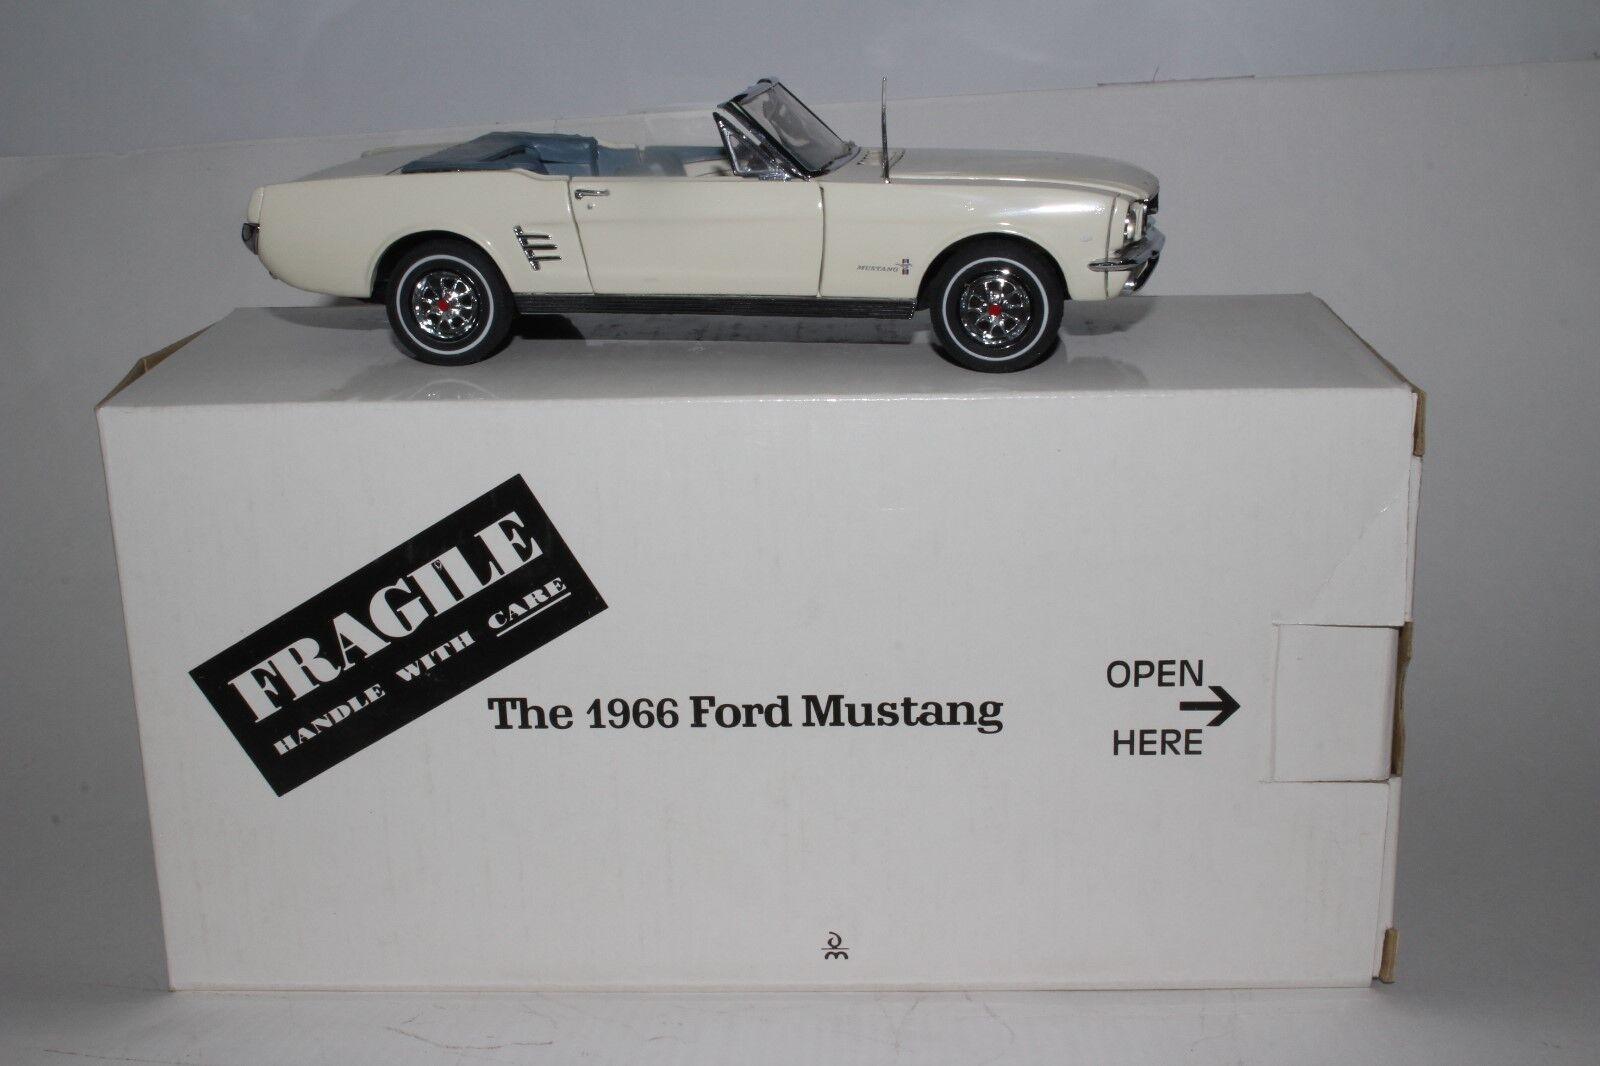 Danbury Mint 1966 Ford Mustang 1 24 Escala Diecast Modelo con Caja